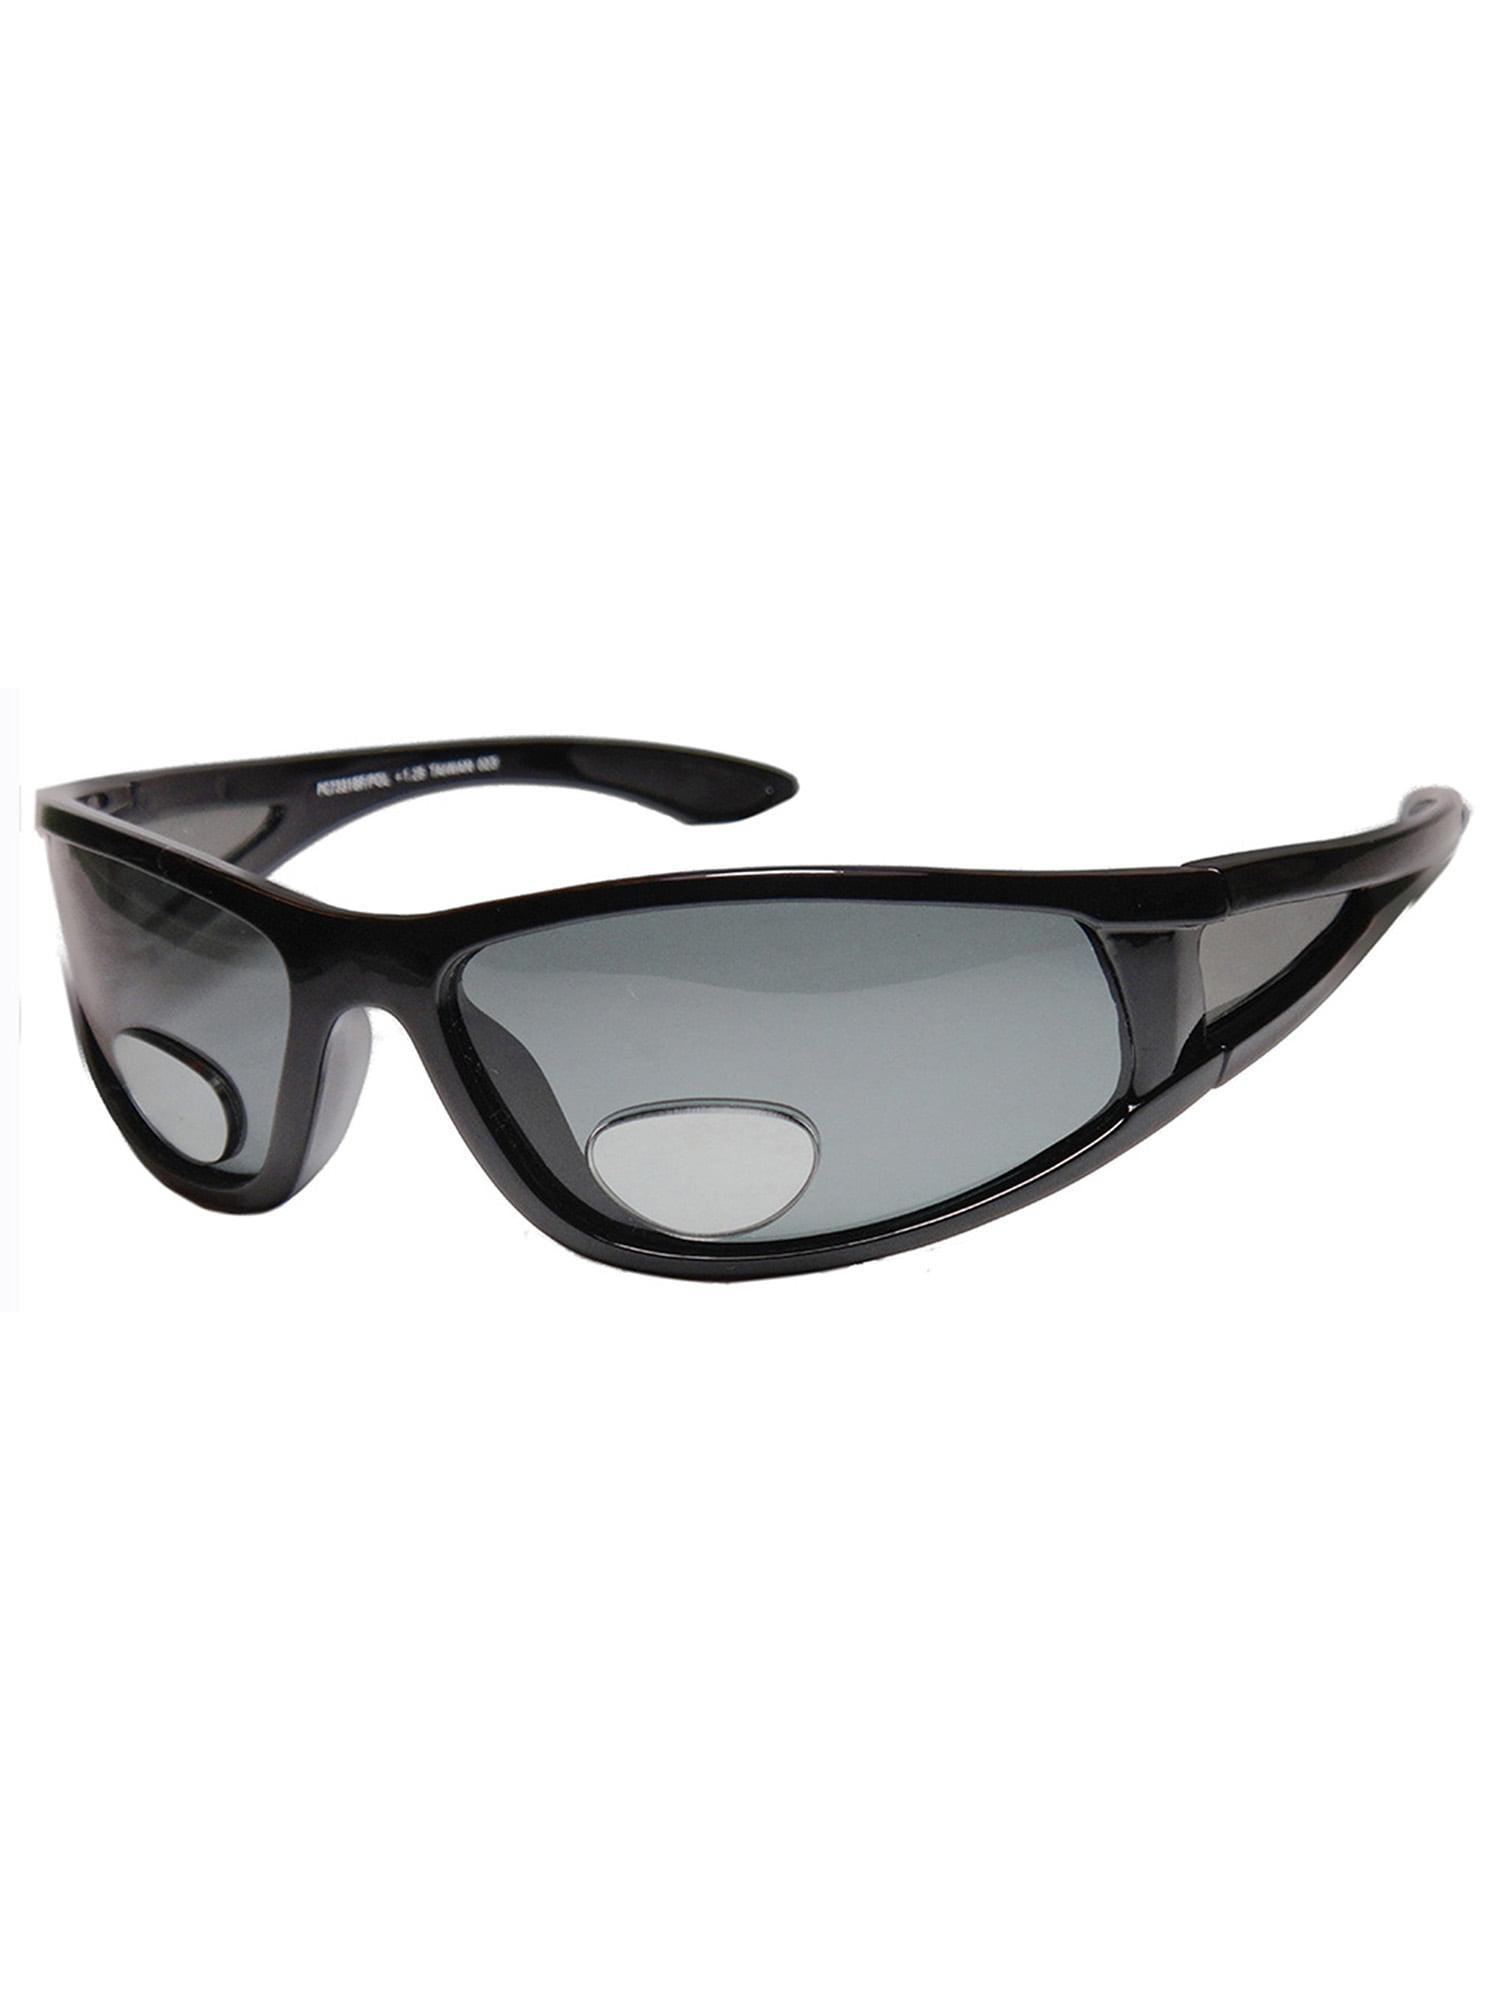 Mens Sports Wrap Around Sunglasses Polarized Bifocal Lens Fly FishingBLACK +1.50